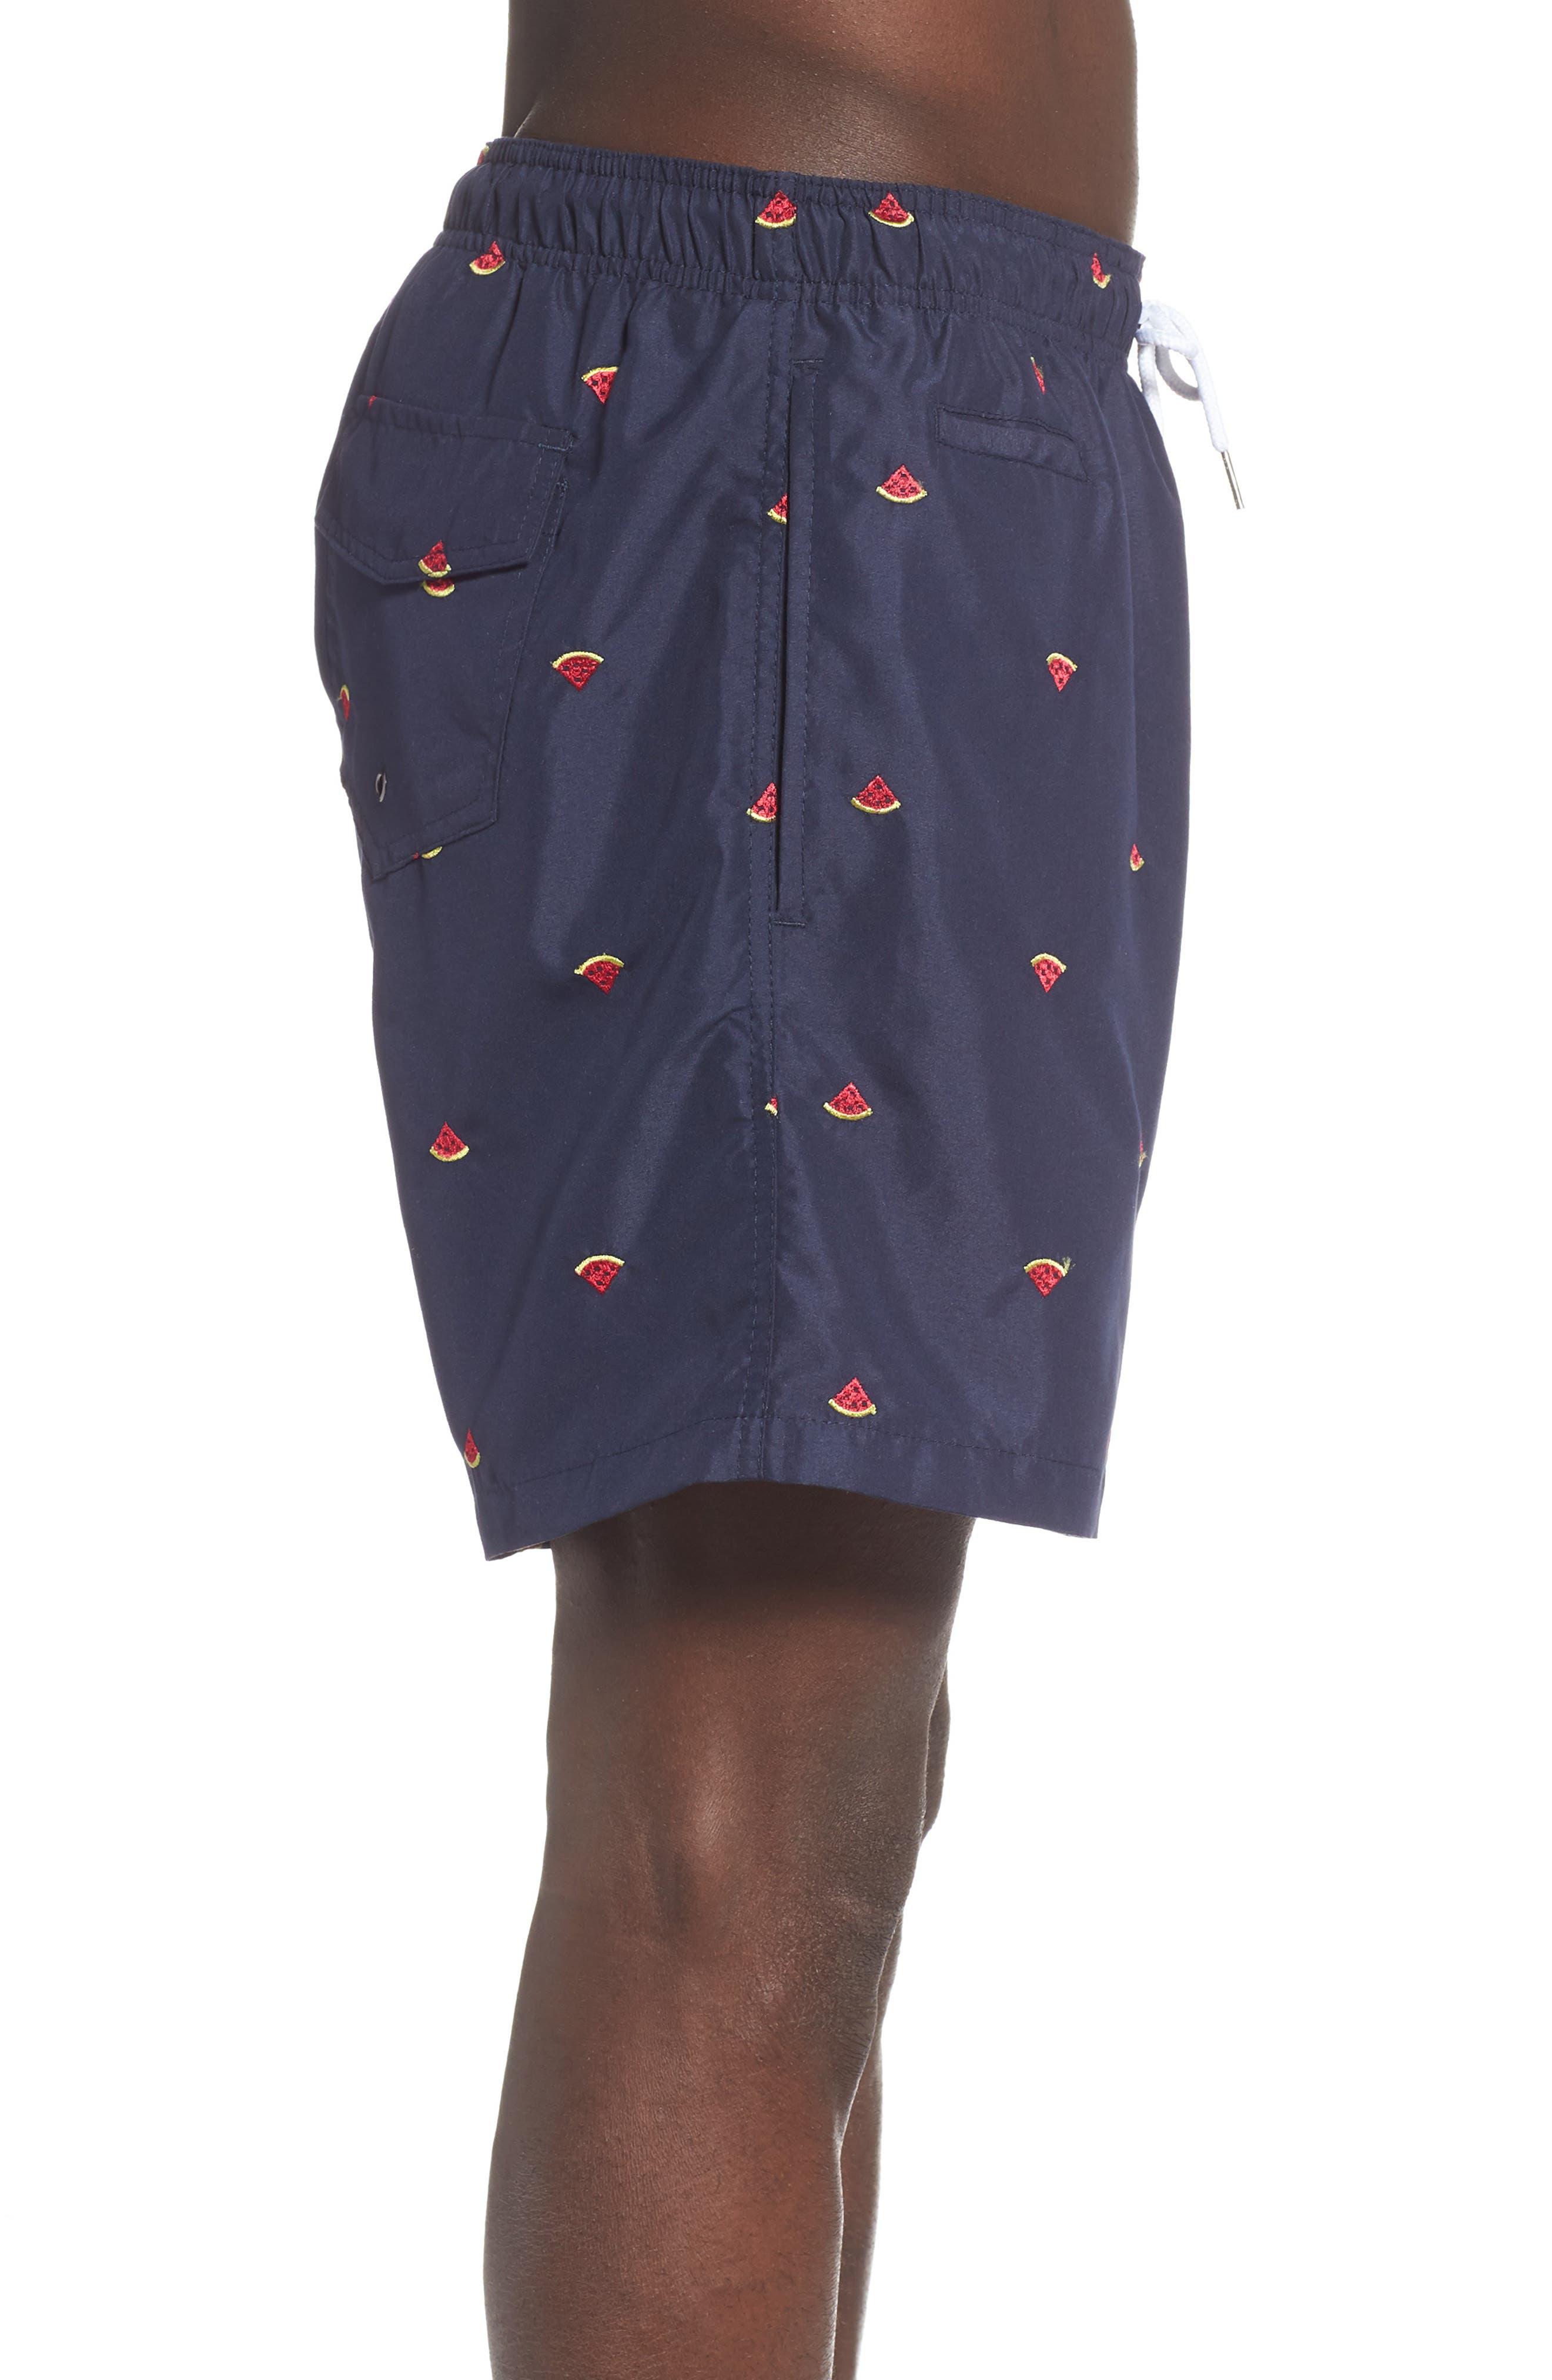 Premium Embroidered Sano Swim Trunks,                             Alternate thumbnail 3, color,                             WATERMELON DRAWING